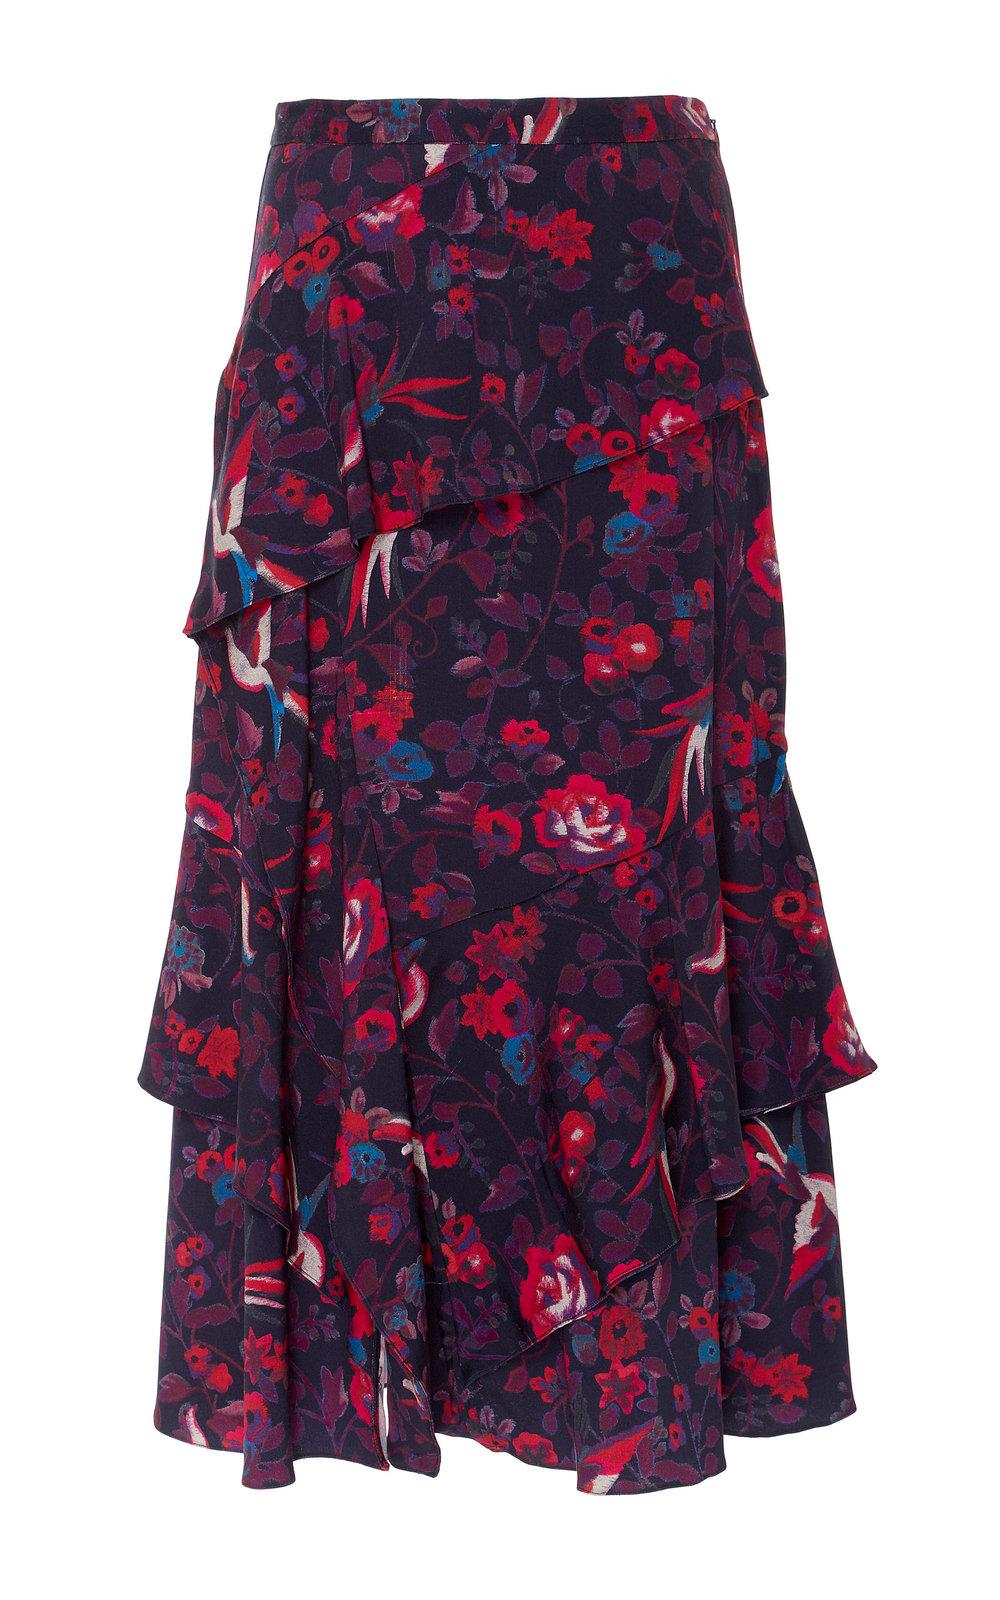 large_tanya-taylor-floral-aurelia-ruffle-skirt.jpg